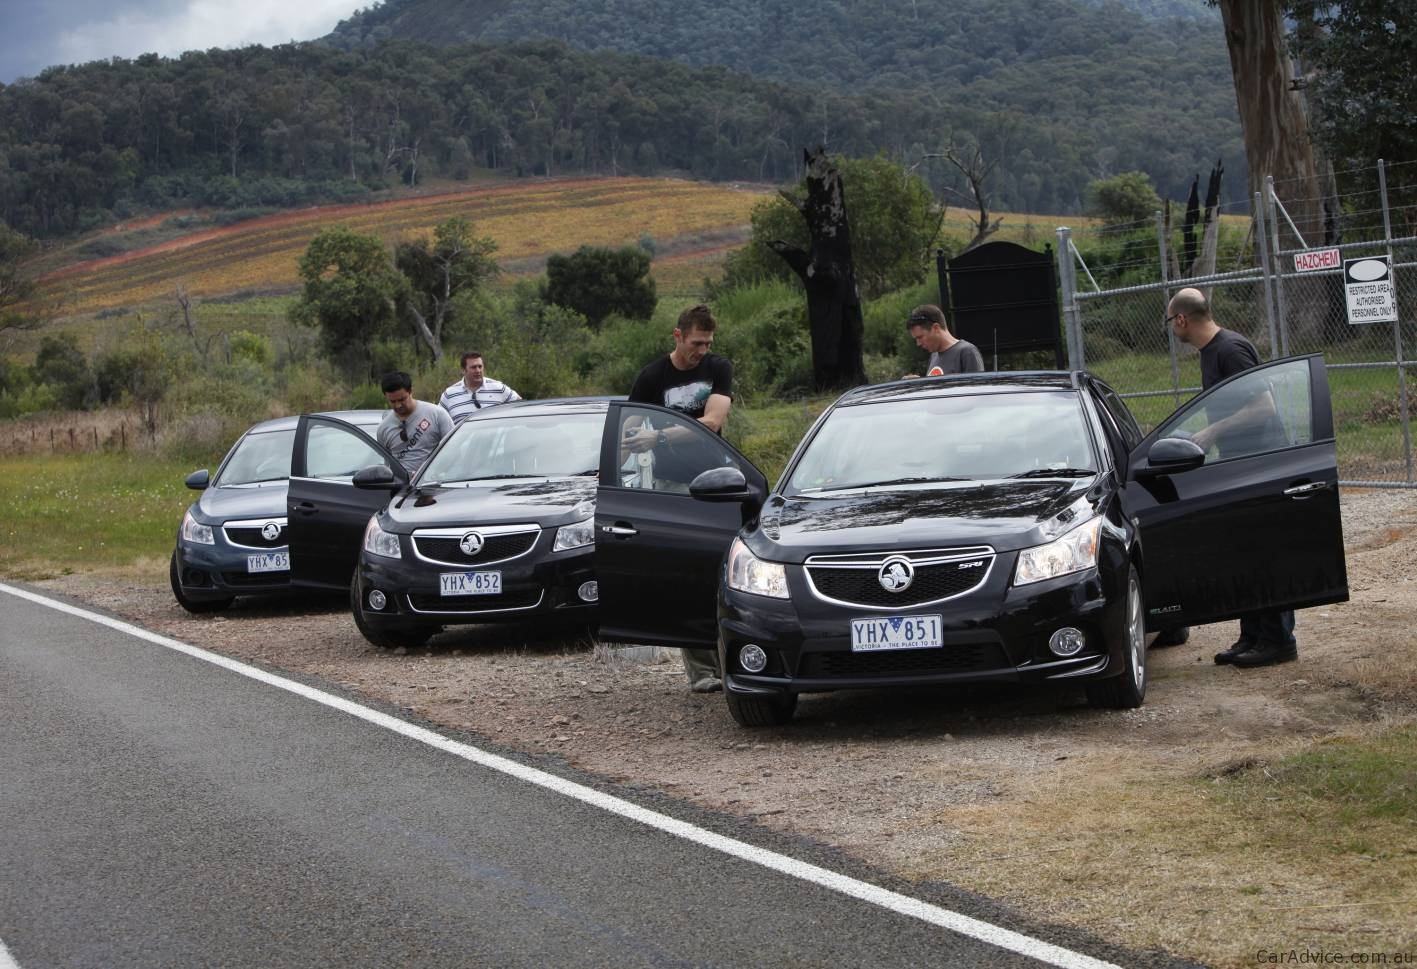 Holden Cruze Hatch On Sale In Australia Photos Caradvice